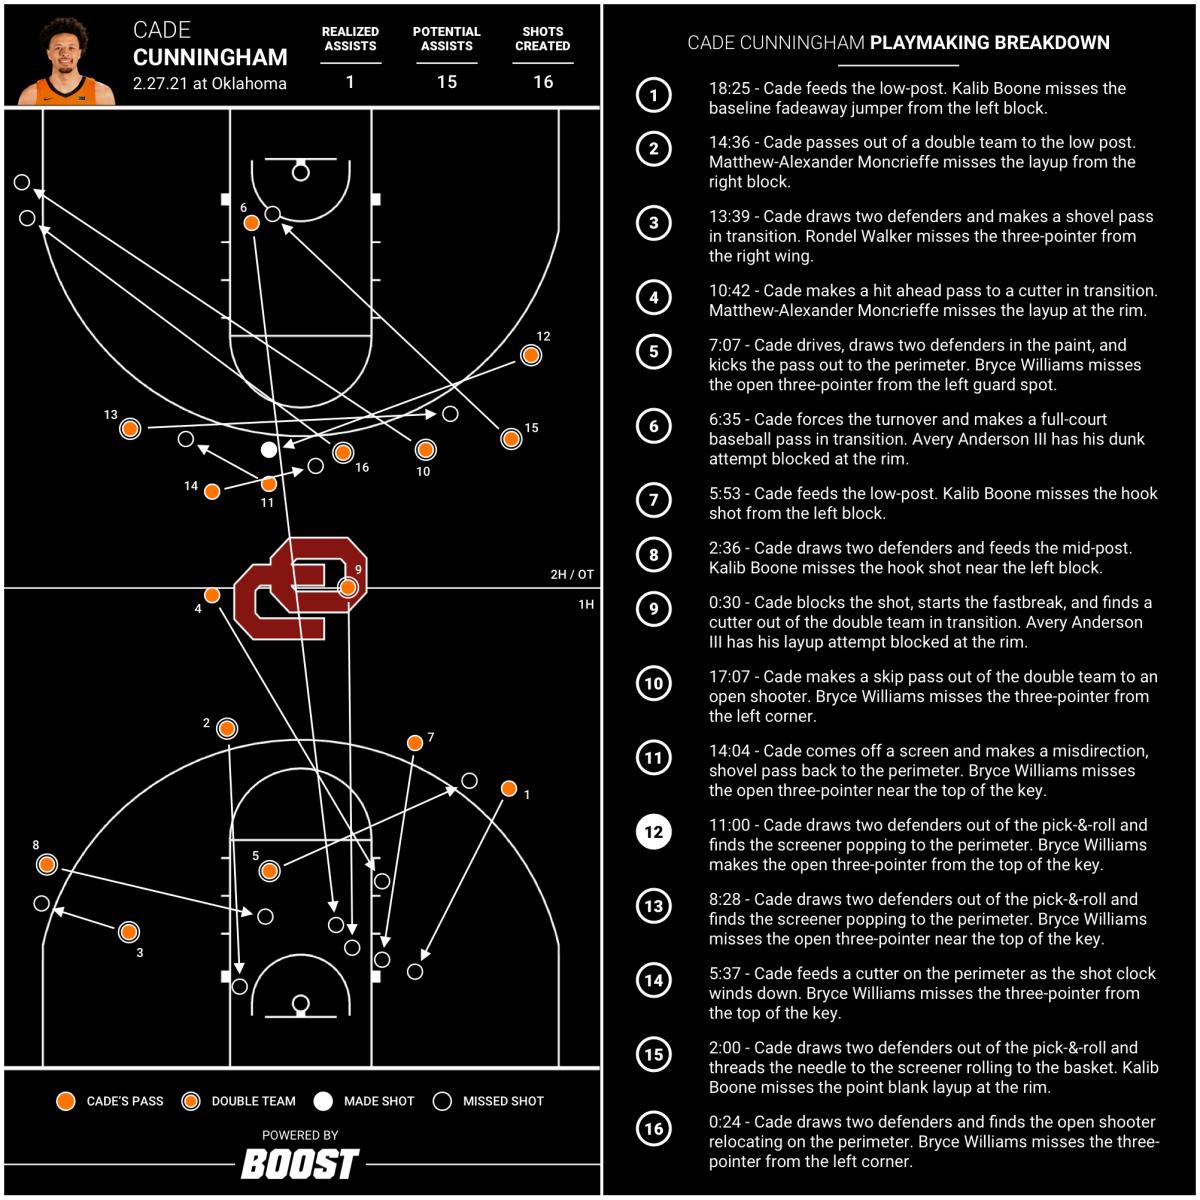 Cade Cunningham (Feb. 27, 2021 at Oklahoma) - Chart + Analysis (1)